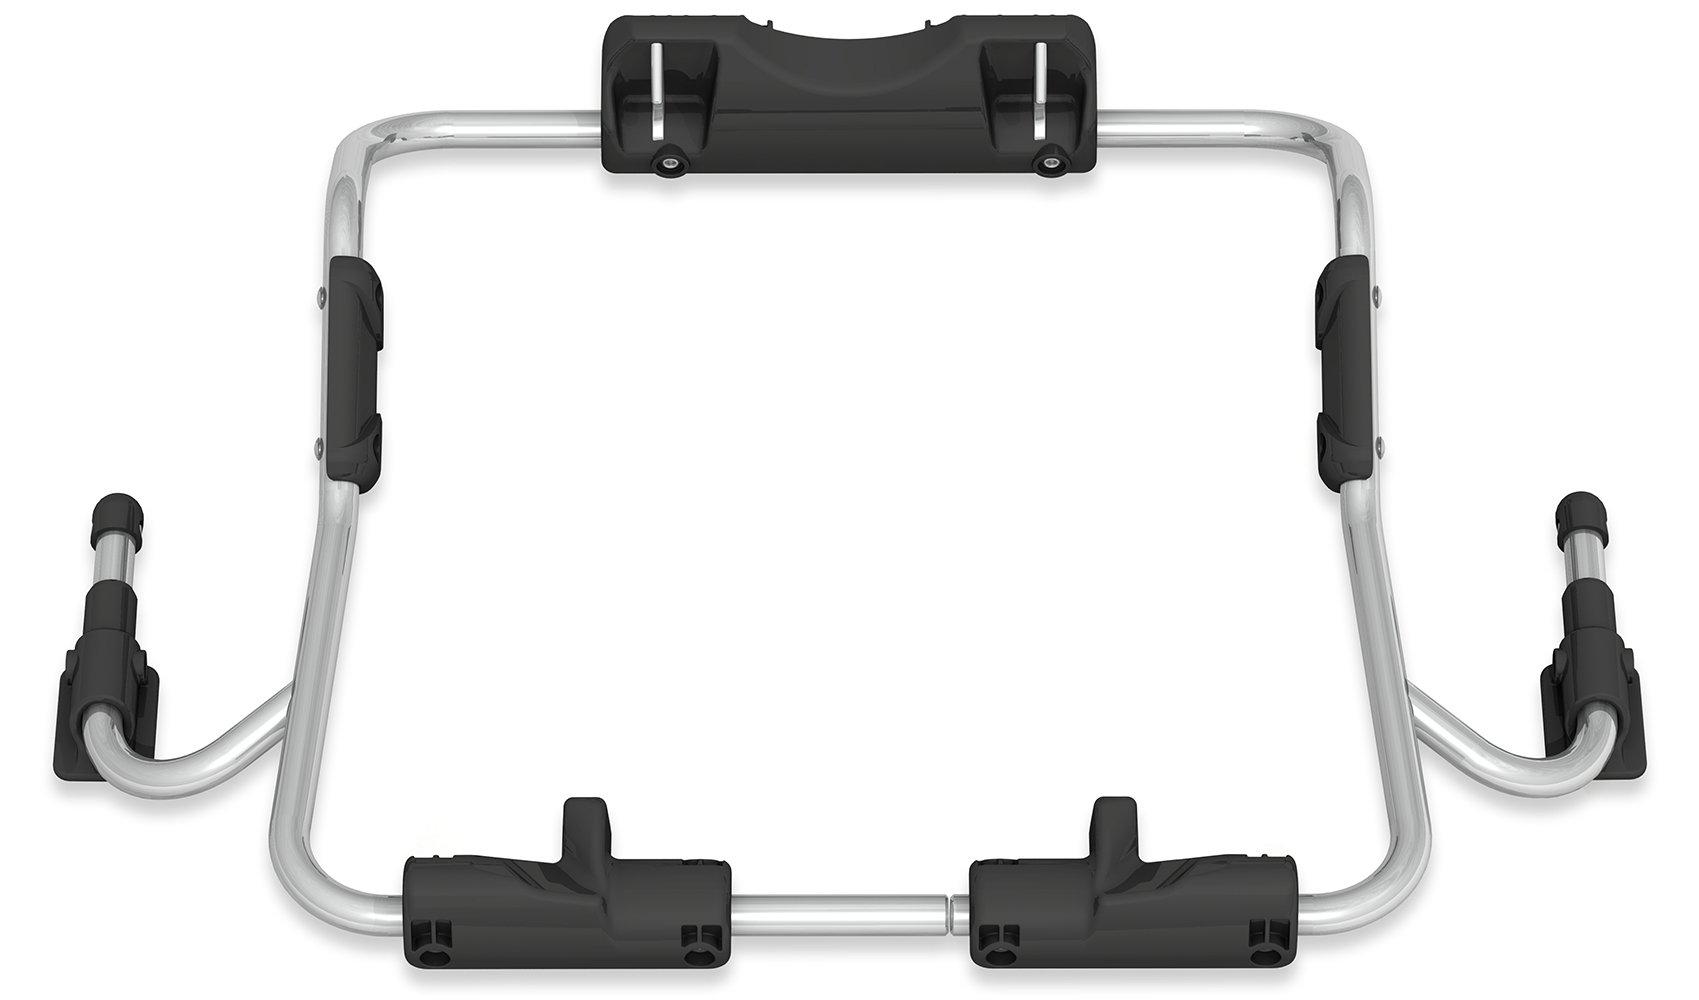 BOB 2016 Single Infant Car Seat Adapter for Graco Infant Car Seats, Black by BOB Gear